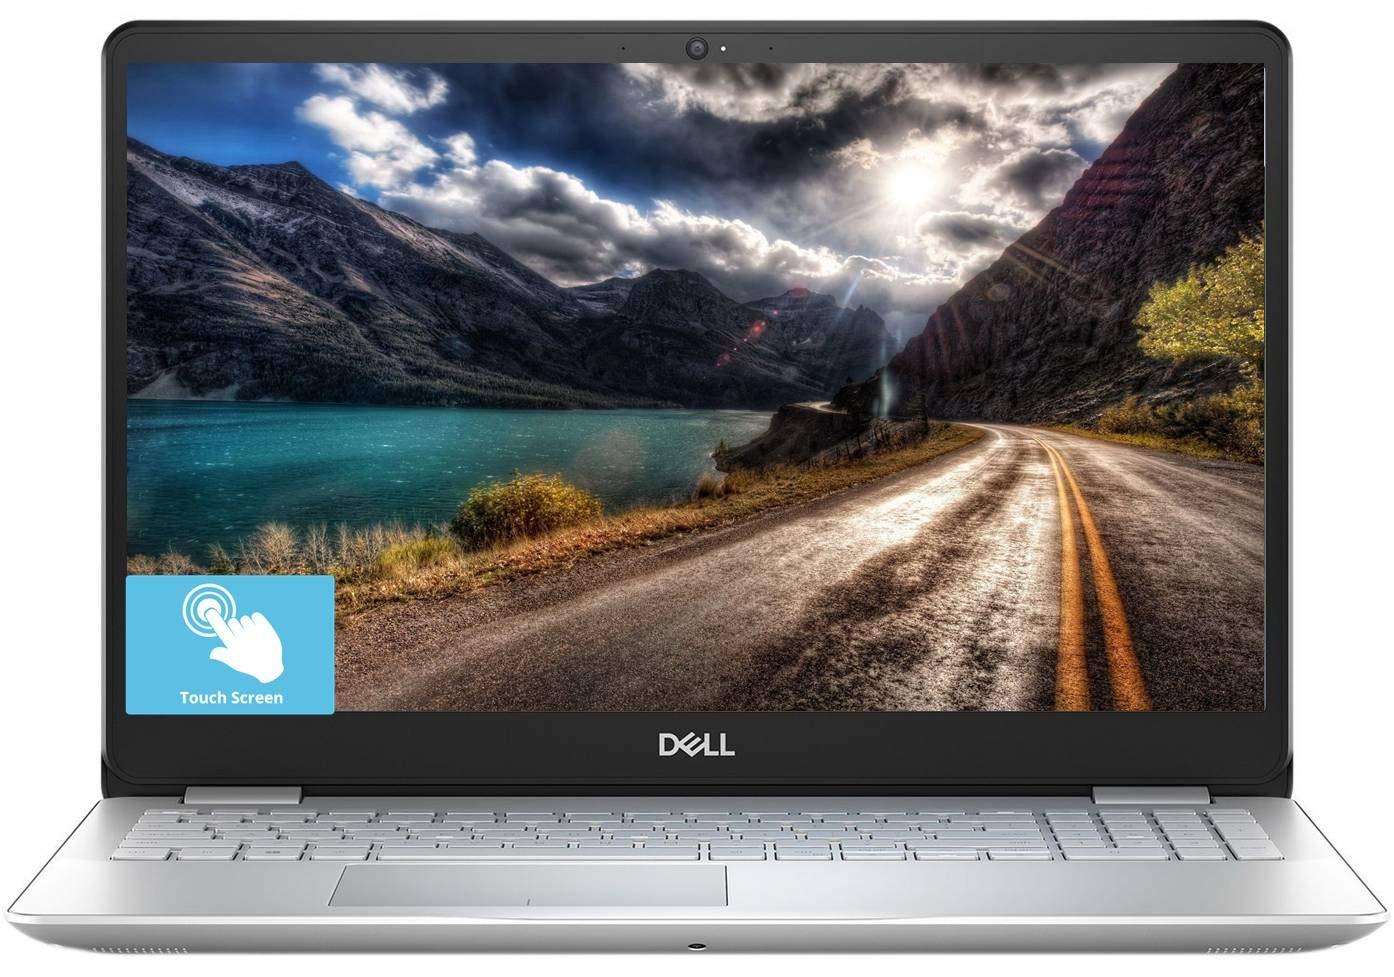 "Dell Inspiron 15 5000, 2019 15.6"" FHD Touchscreen Laptop, Intel 4-Core i5-8265U, 12GB RAM, 256GB PCIe SSD by 16GB Optane, 1TB HDD, Backlit KB Fingerprint Reader MaxxAudio Win 10/Accessories Bundle 1"